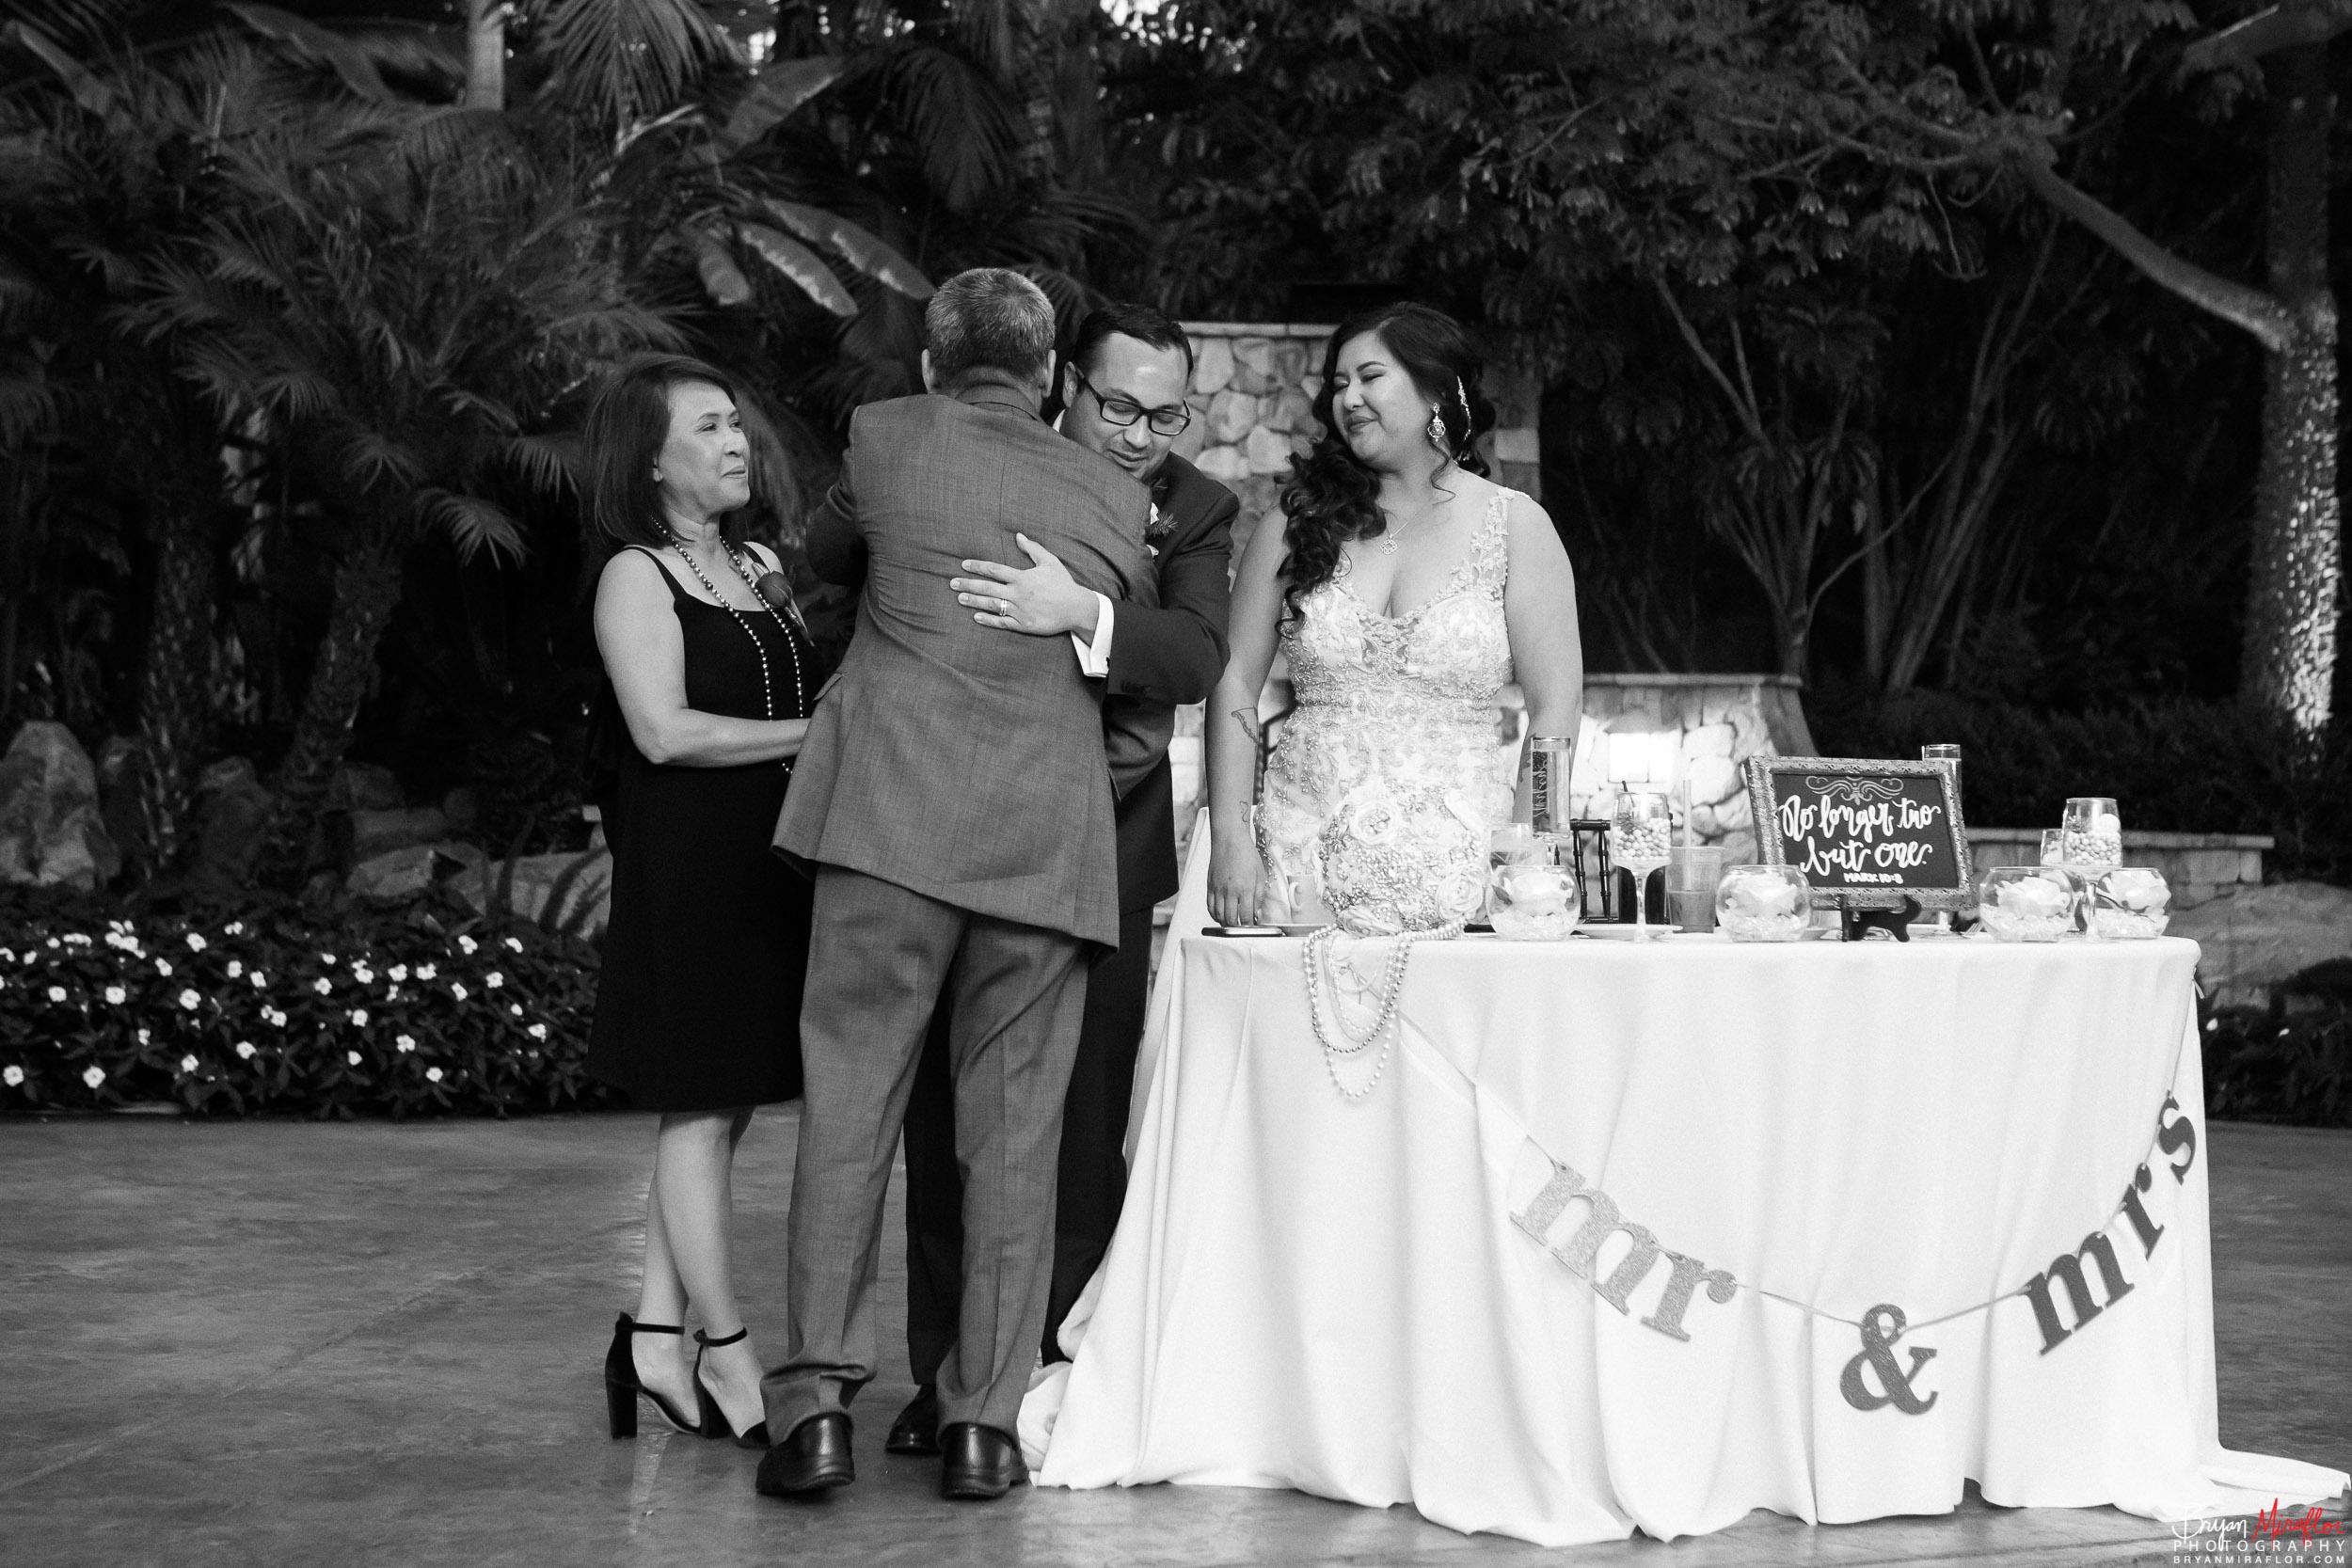 Bryan-Miraflor-Photography-Hannah-Jonathan-Married-Grand-Traditions-Estate-Gardens-Fallbrook-20171222-188.jpg